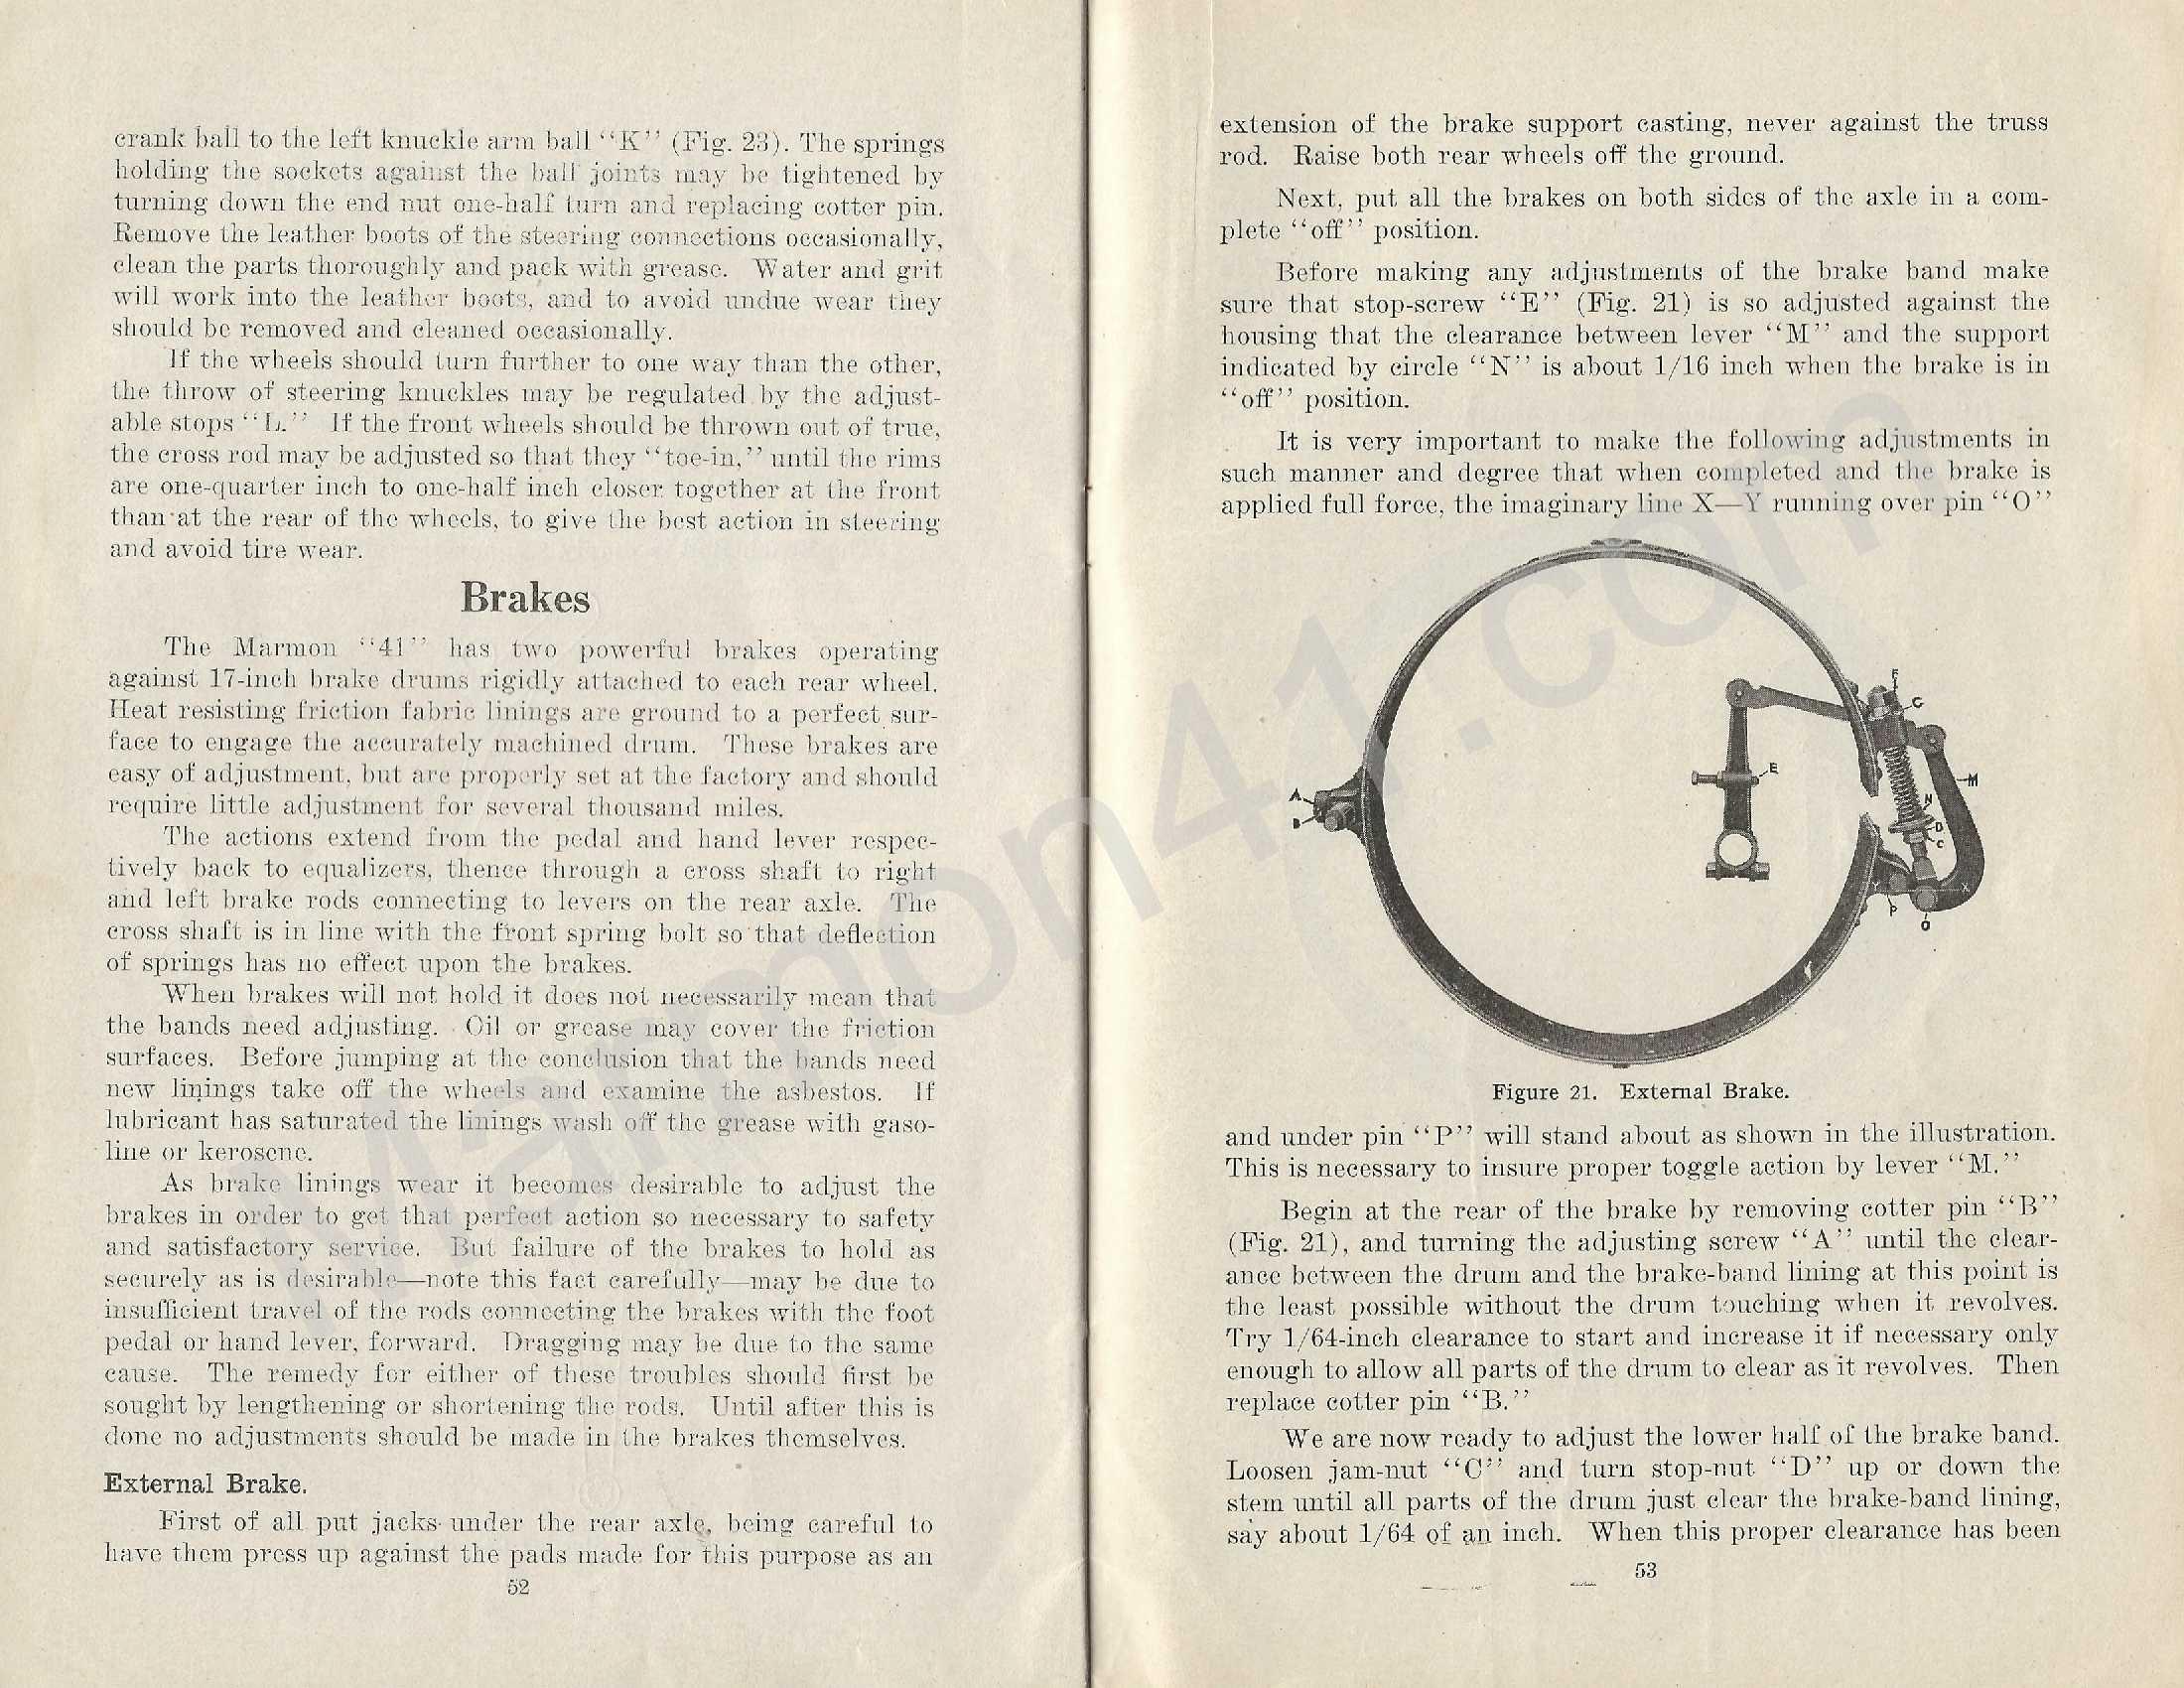 1915-07-01_Marmon41_Info_Book_1534-B_28